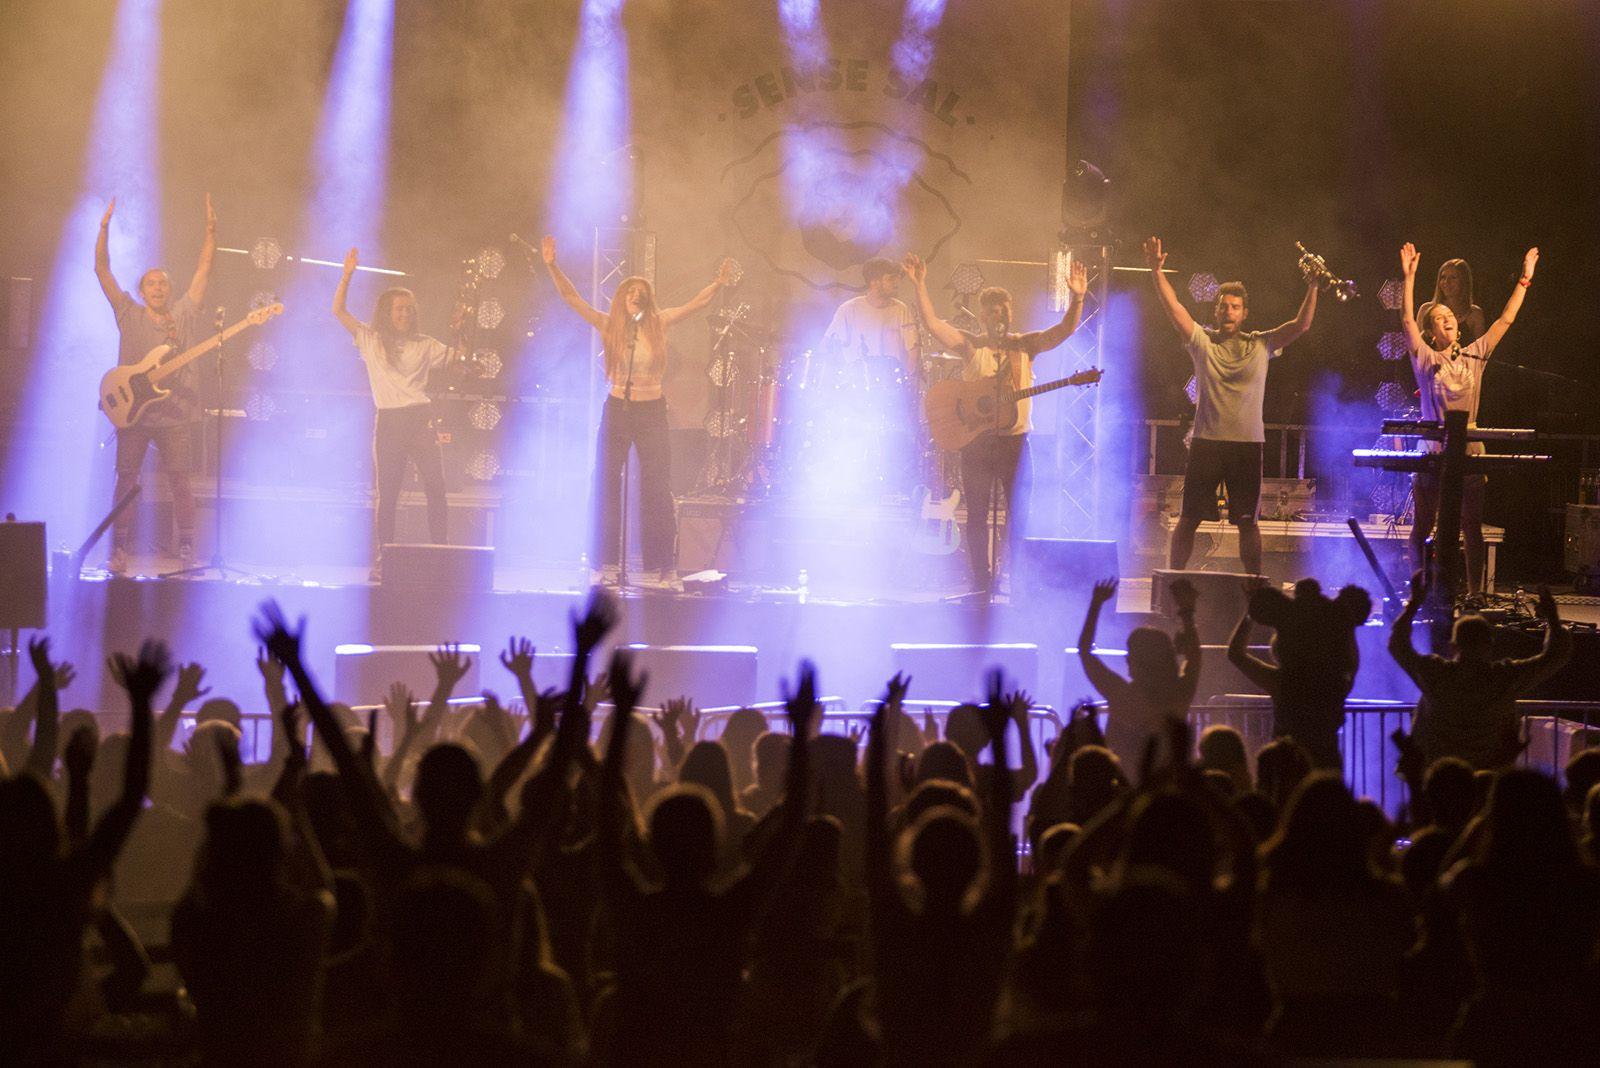 Sense sal, en concert. Foto: Bernat Millet.